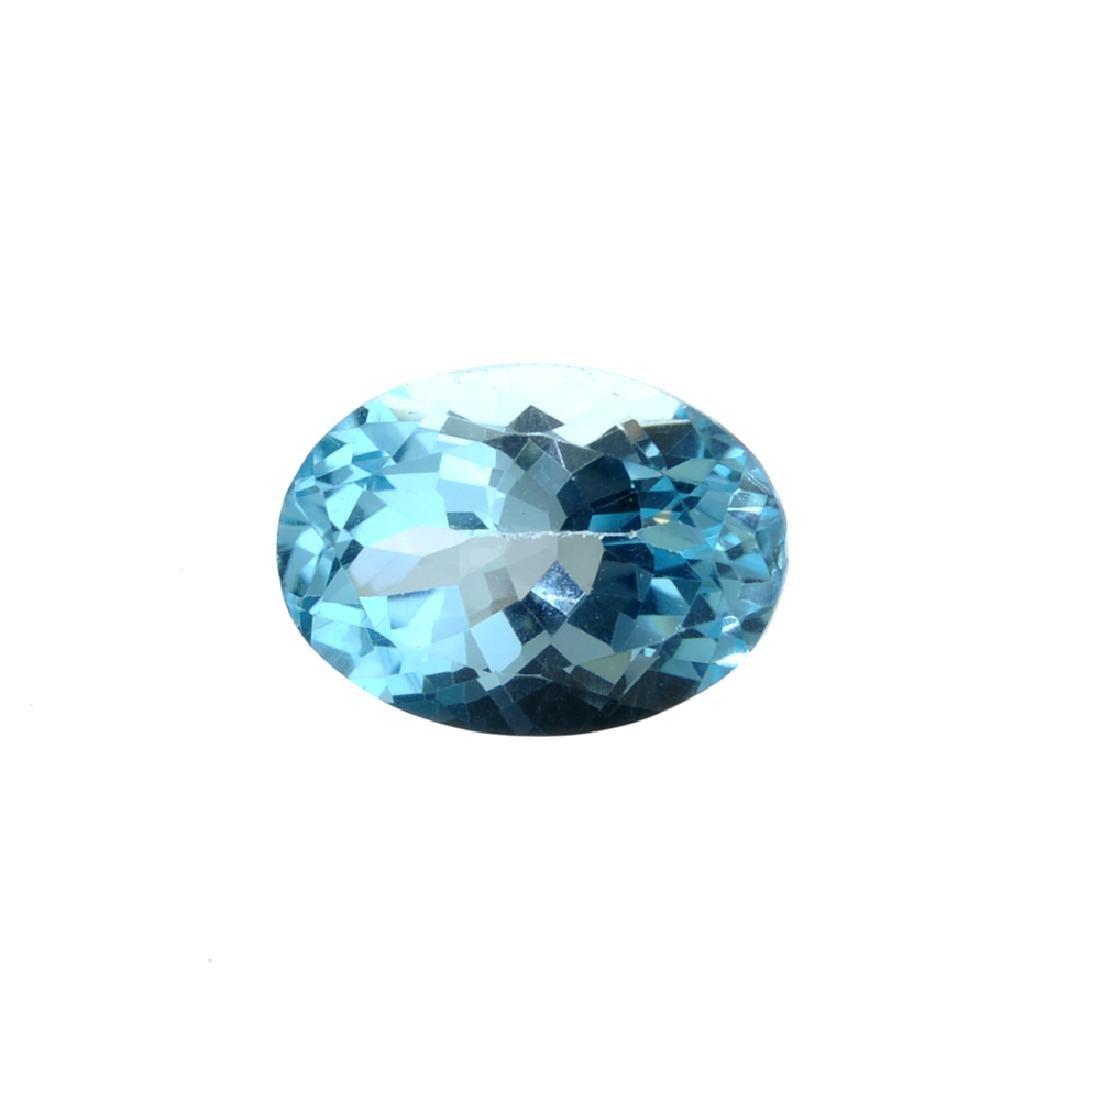 APP: 0.5k 15.18CT Oval Cut Blue Topaz Gemstone